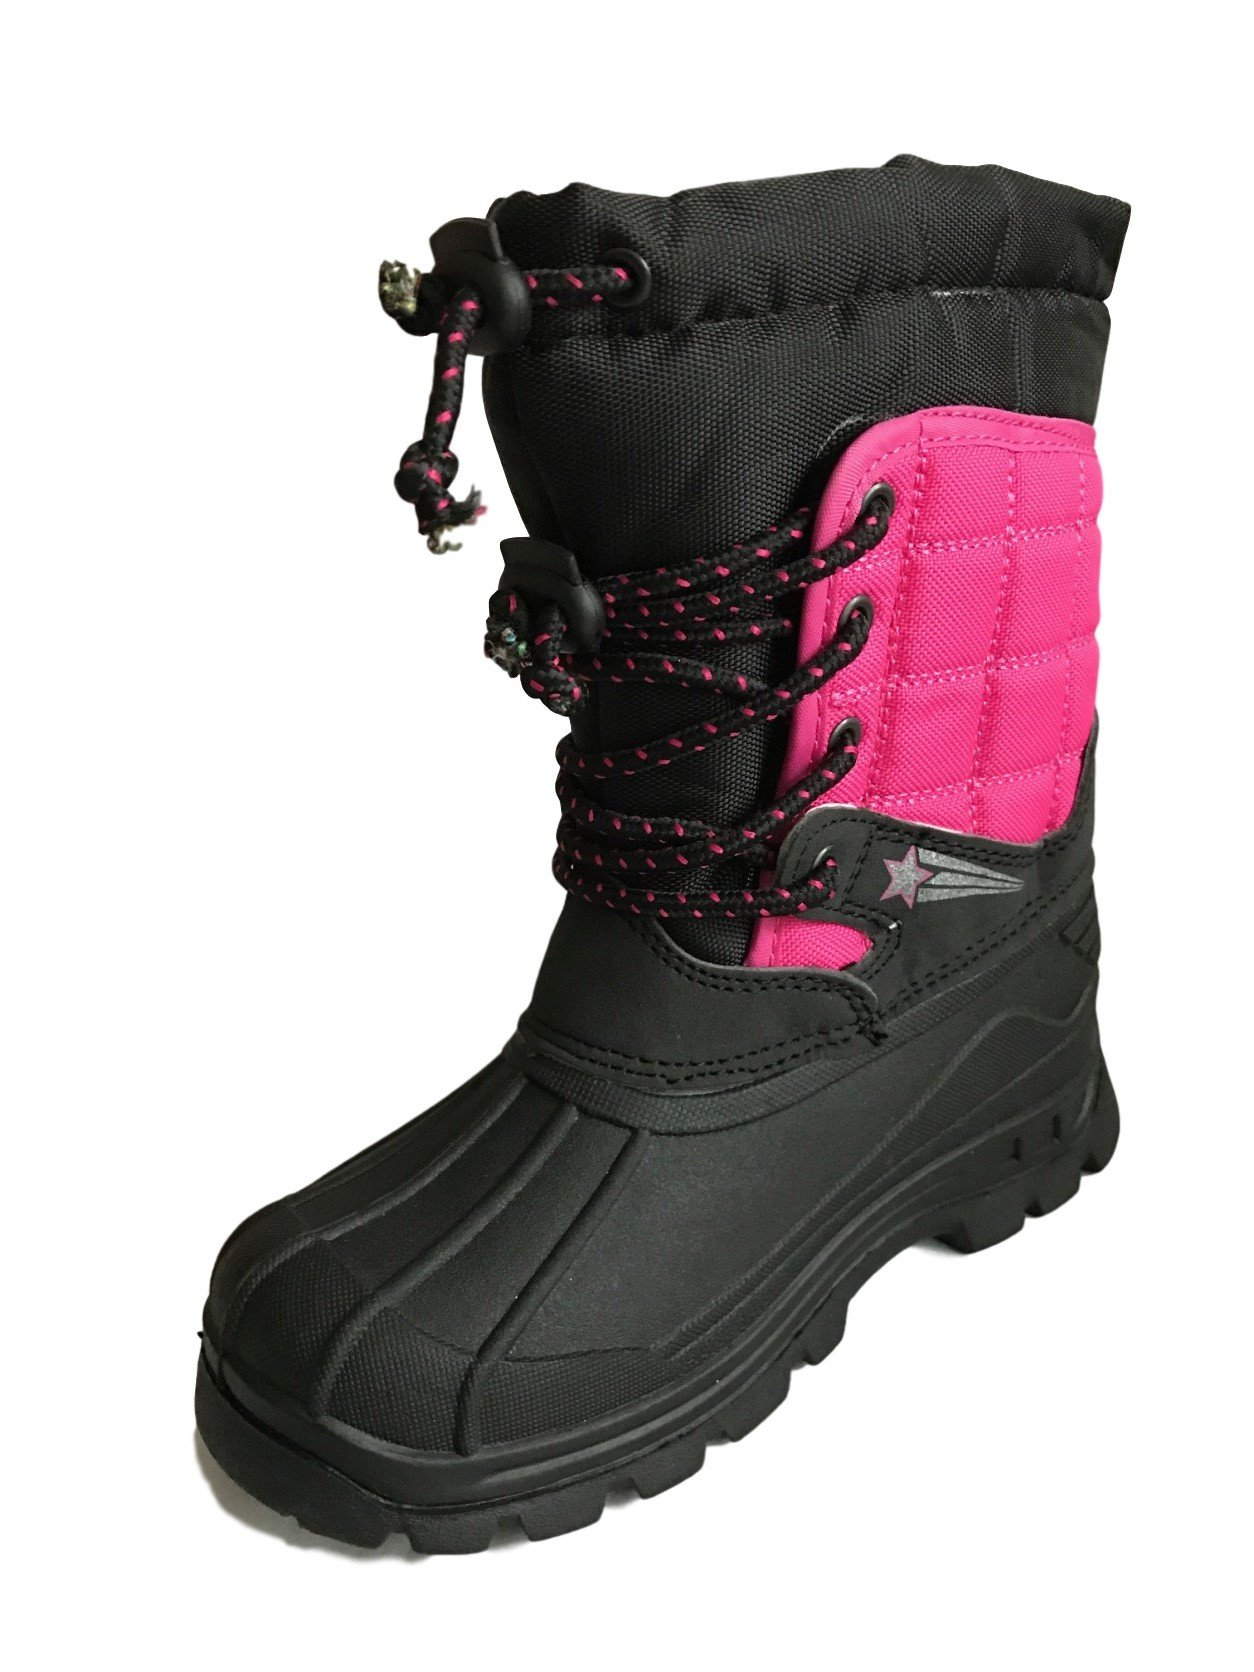 Kids Childrens Boys Spiderman Black Wellies Snow Rain Wellington Boots Size 8-2